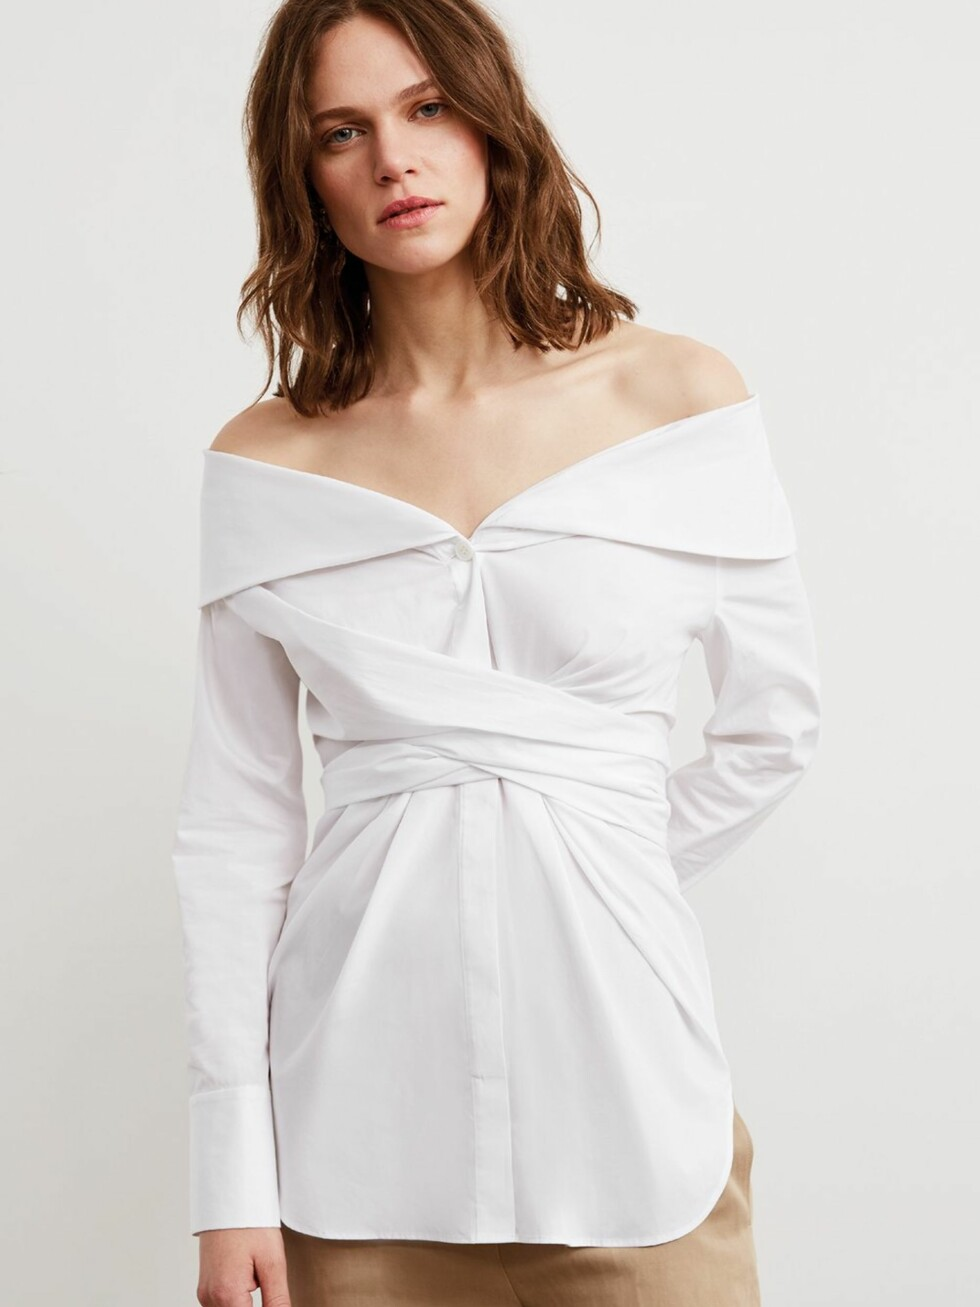 Topp fra Kitri Studio |977,-| https://kitristudio.eu/collections/fresh-in/products/kennedy-white-cotton-long-sleeve-off-shoulder-shirt